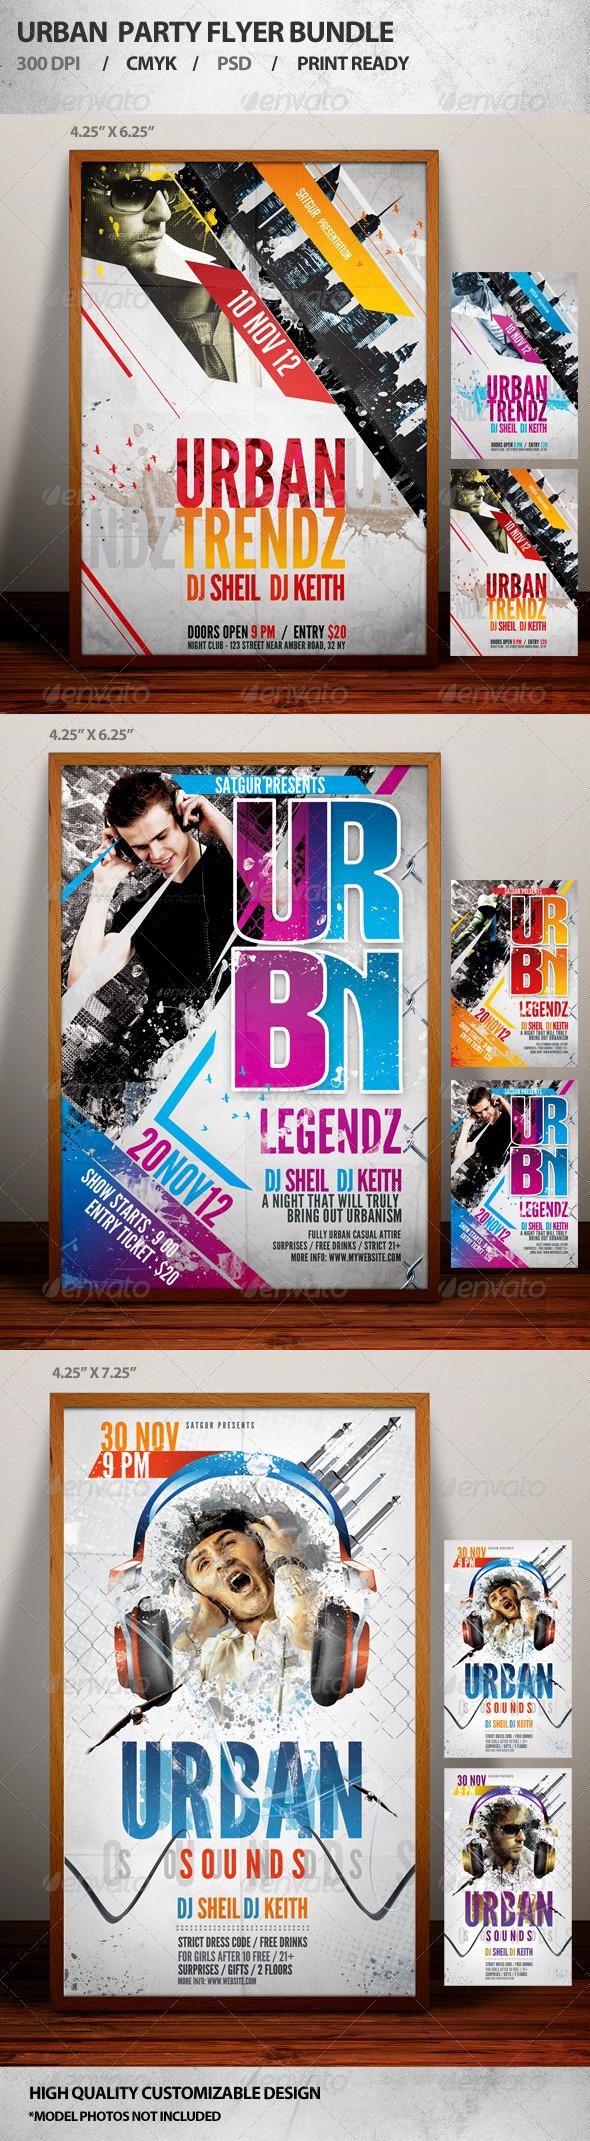 Urban Party Flyer Bundle